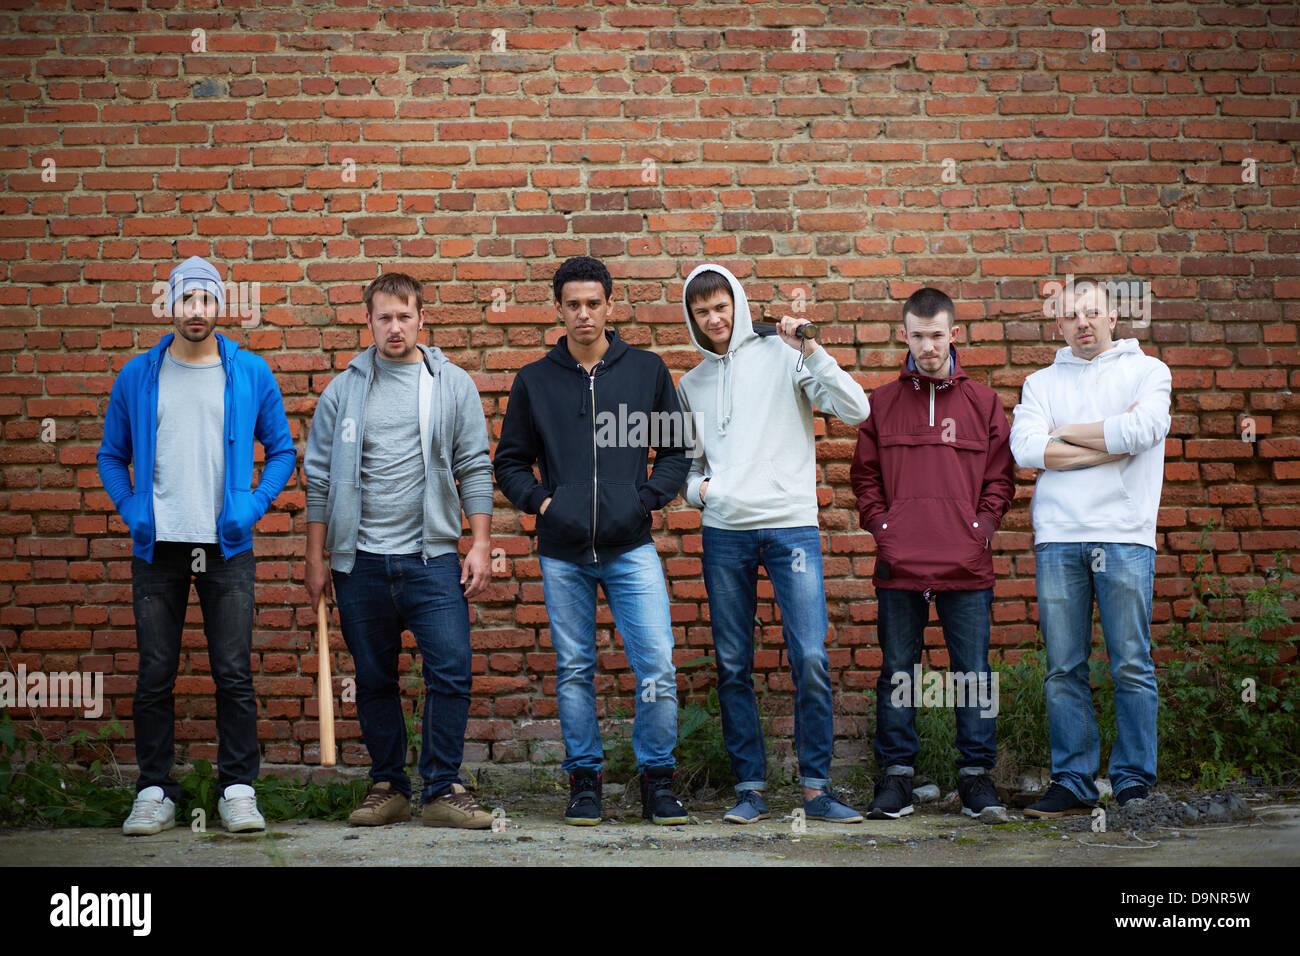 Portrait of several street hooligans or rappers - Stock Image